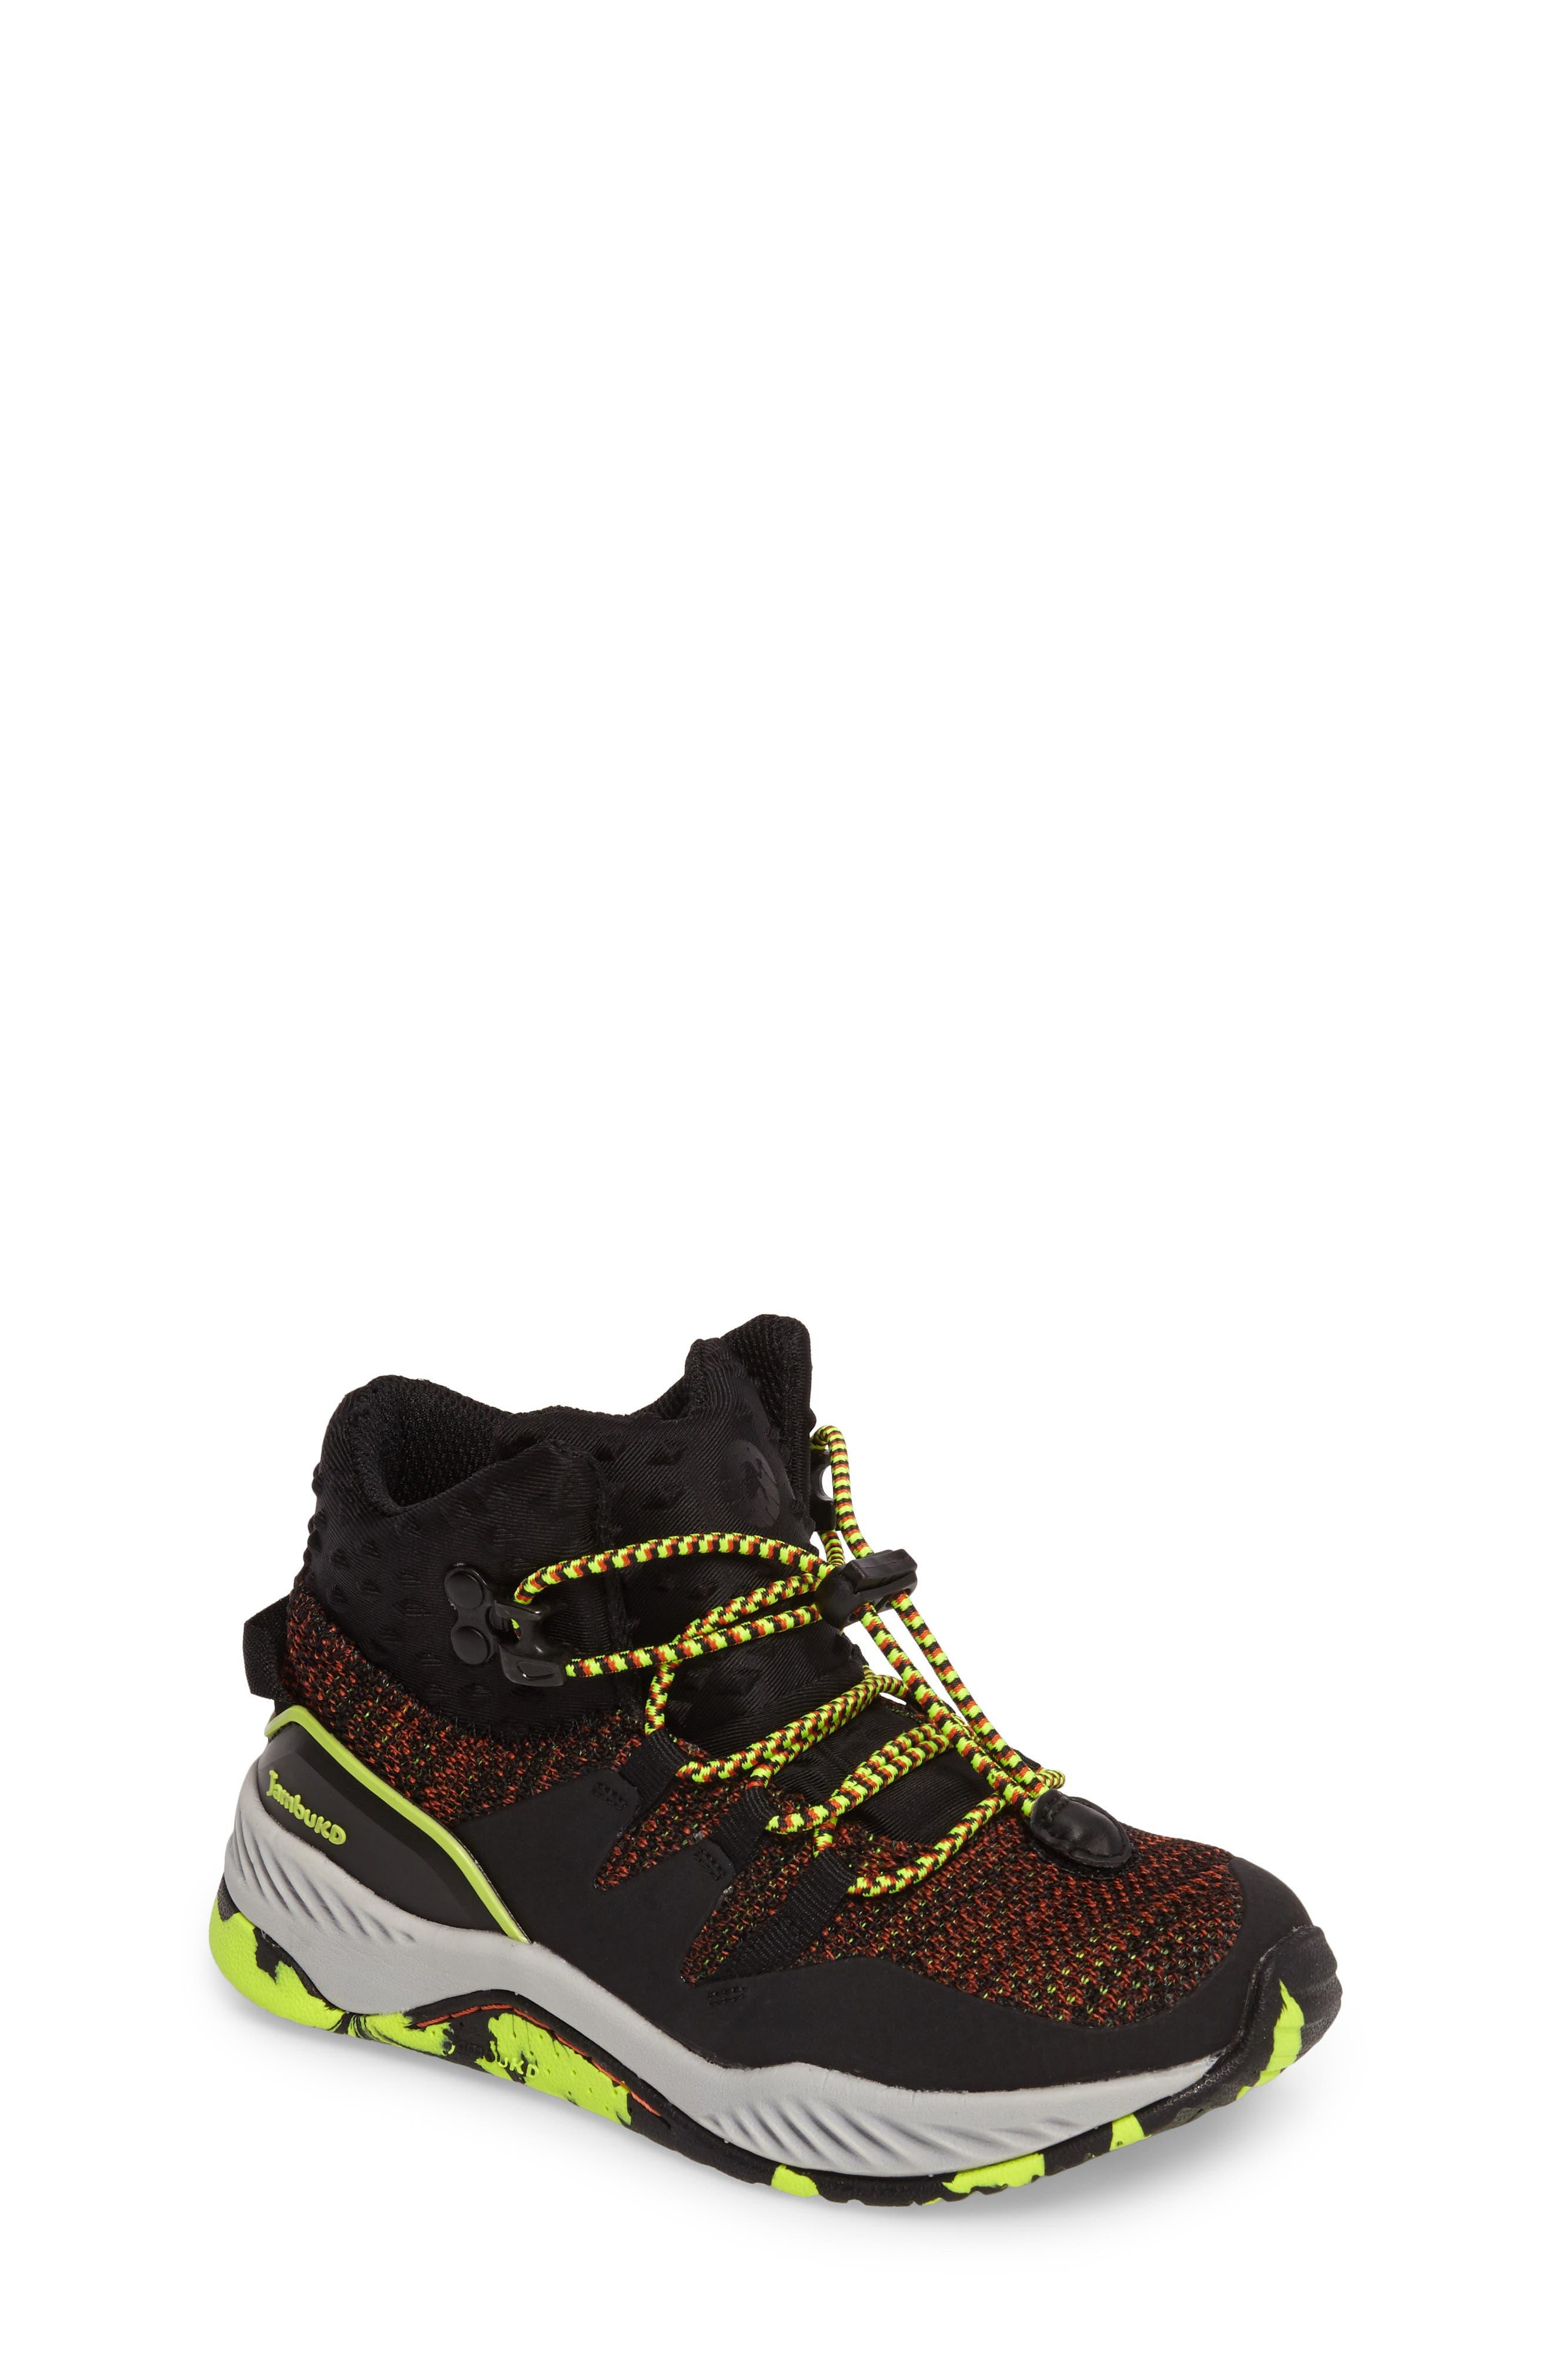 Jambu Armadillo Sneaker Boot (Toddler, Little Kid & Big Kid)